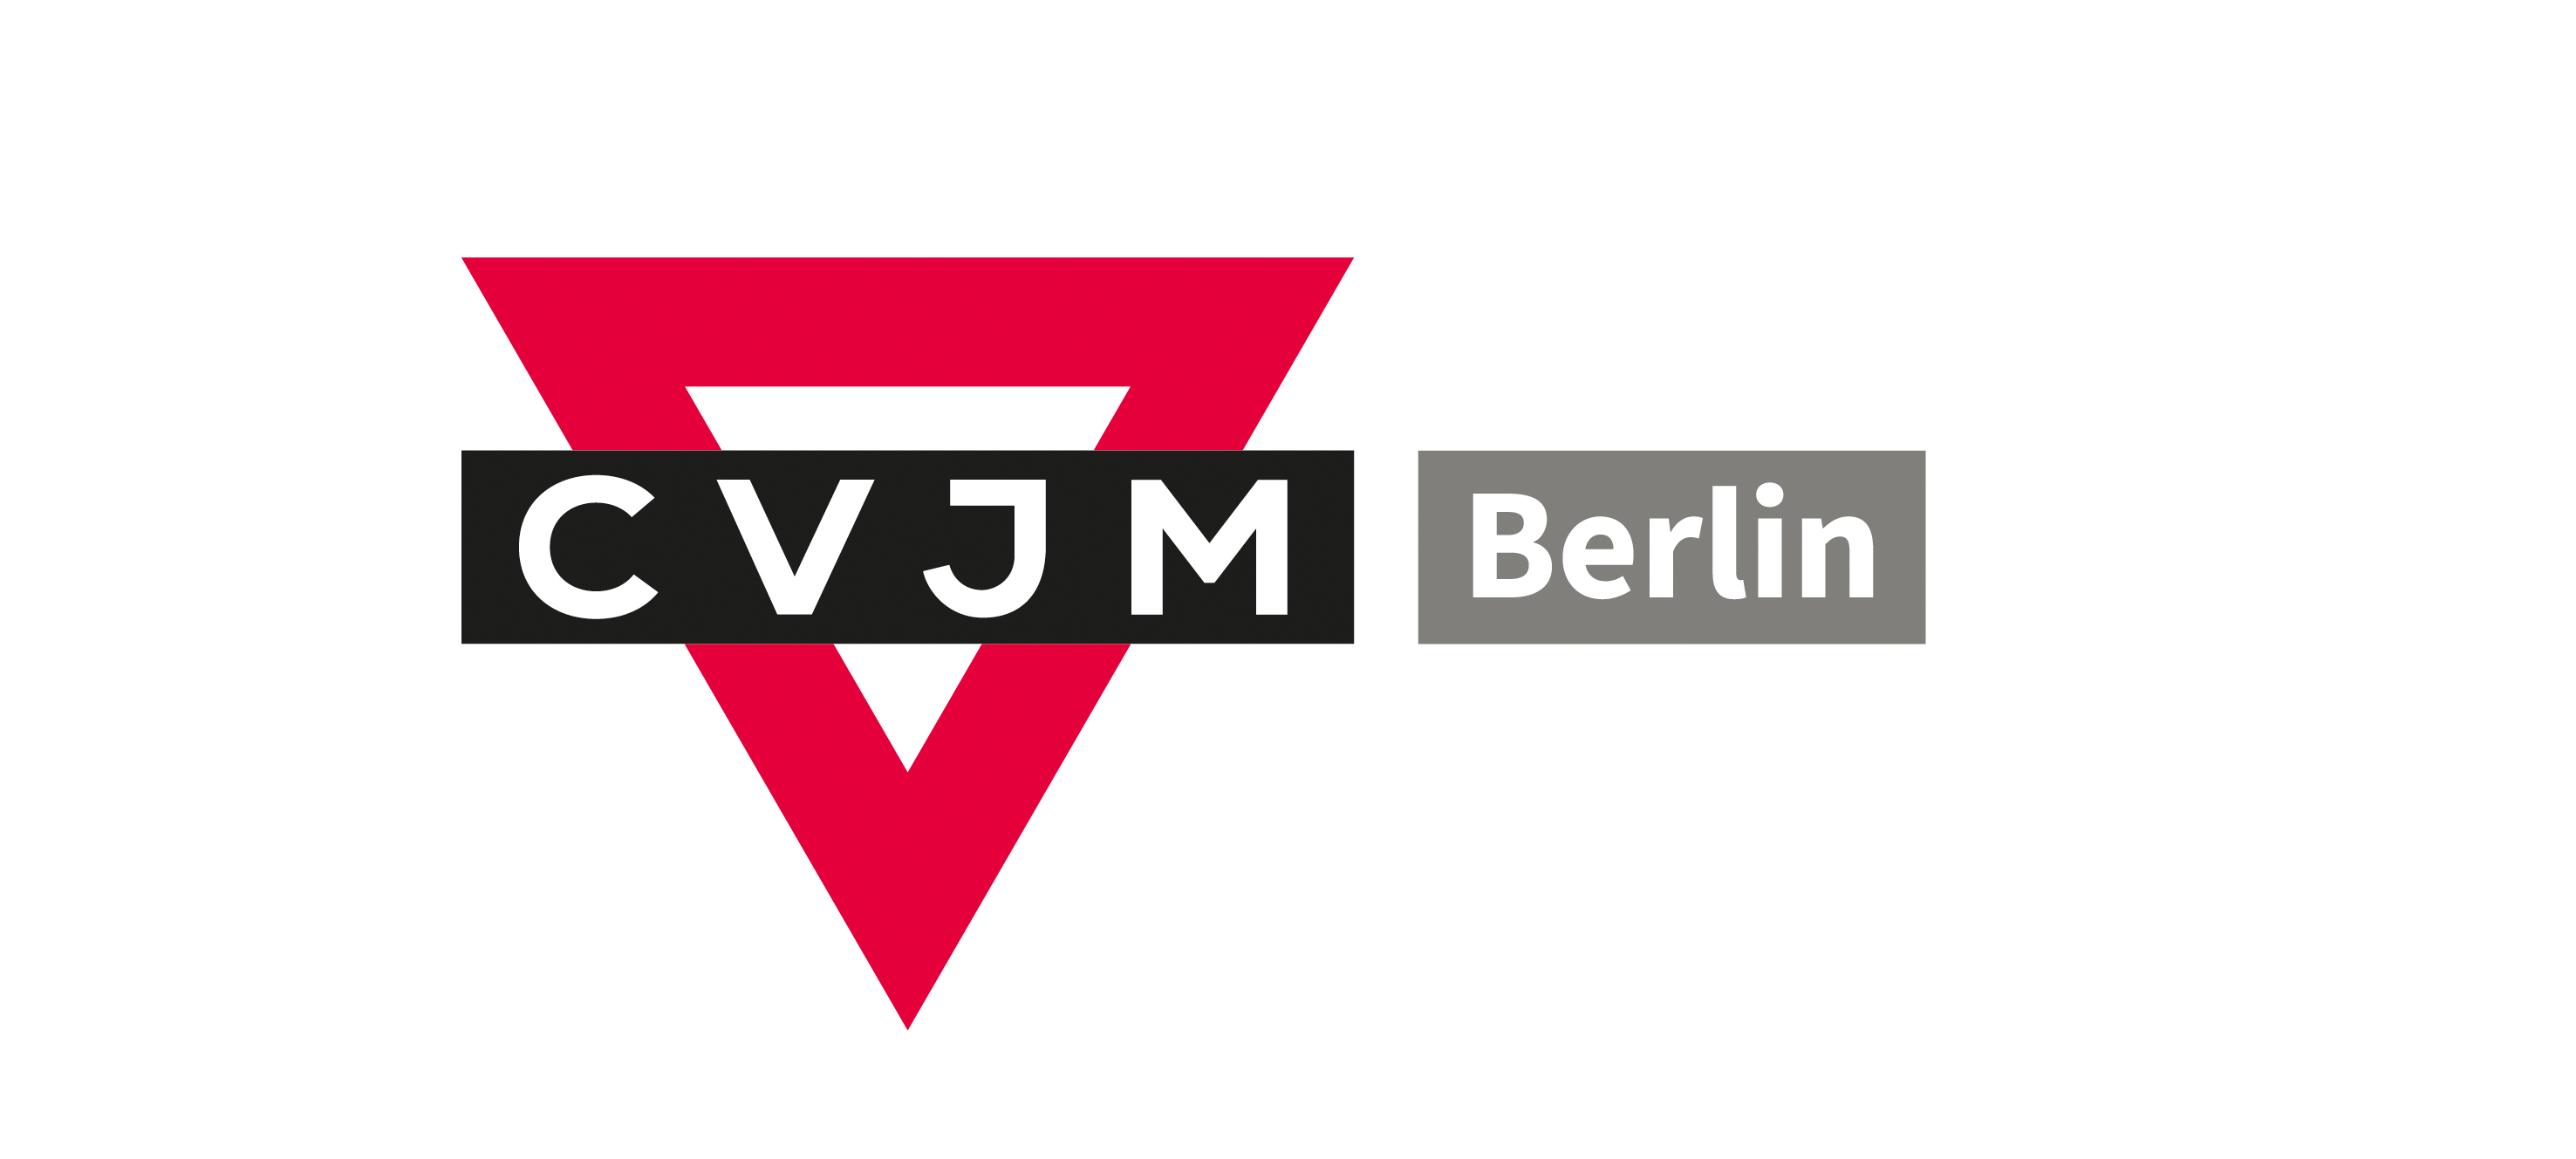 CVJM Berlin